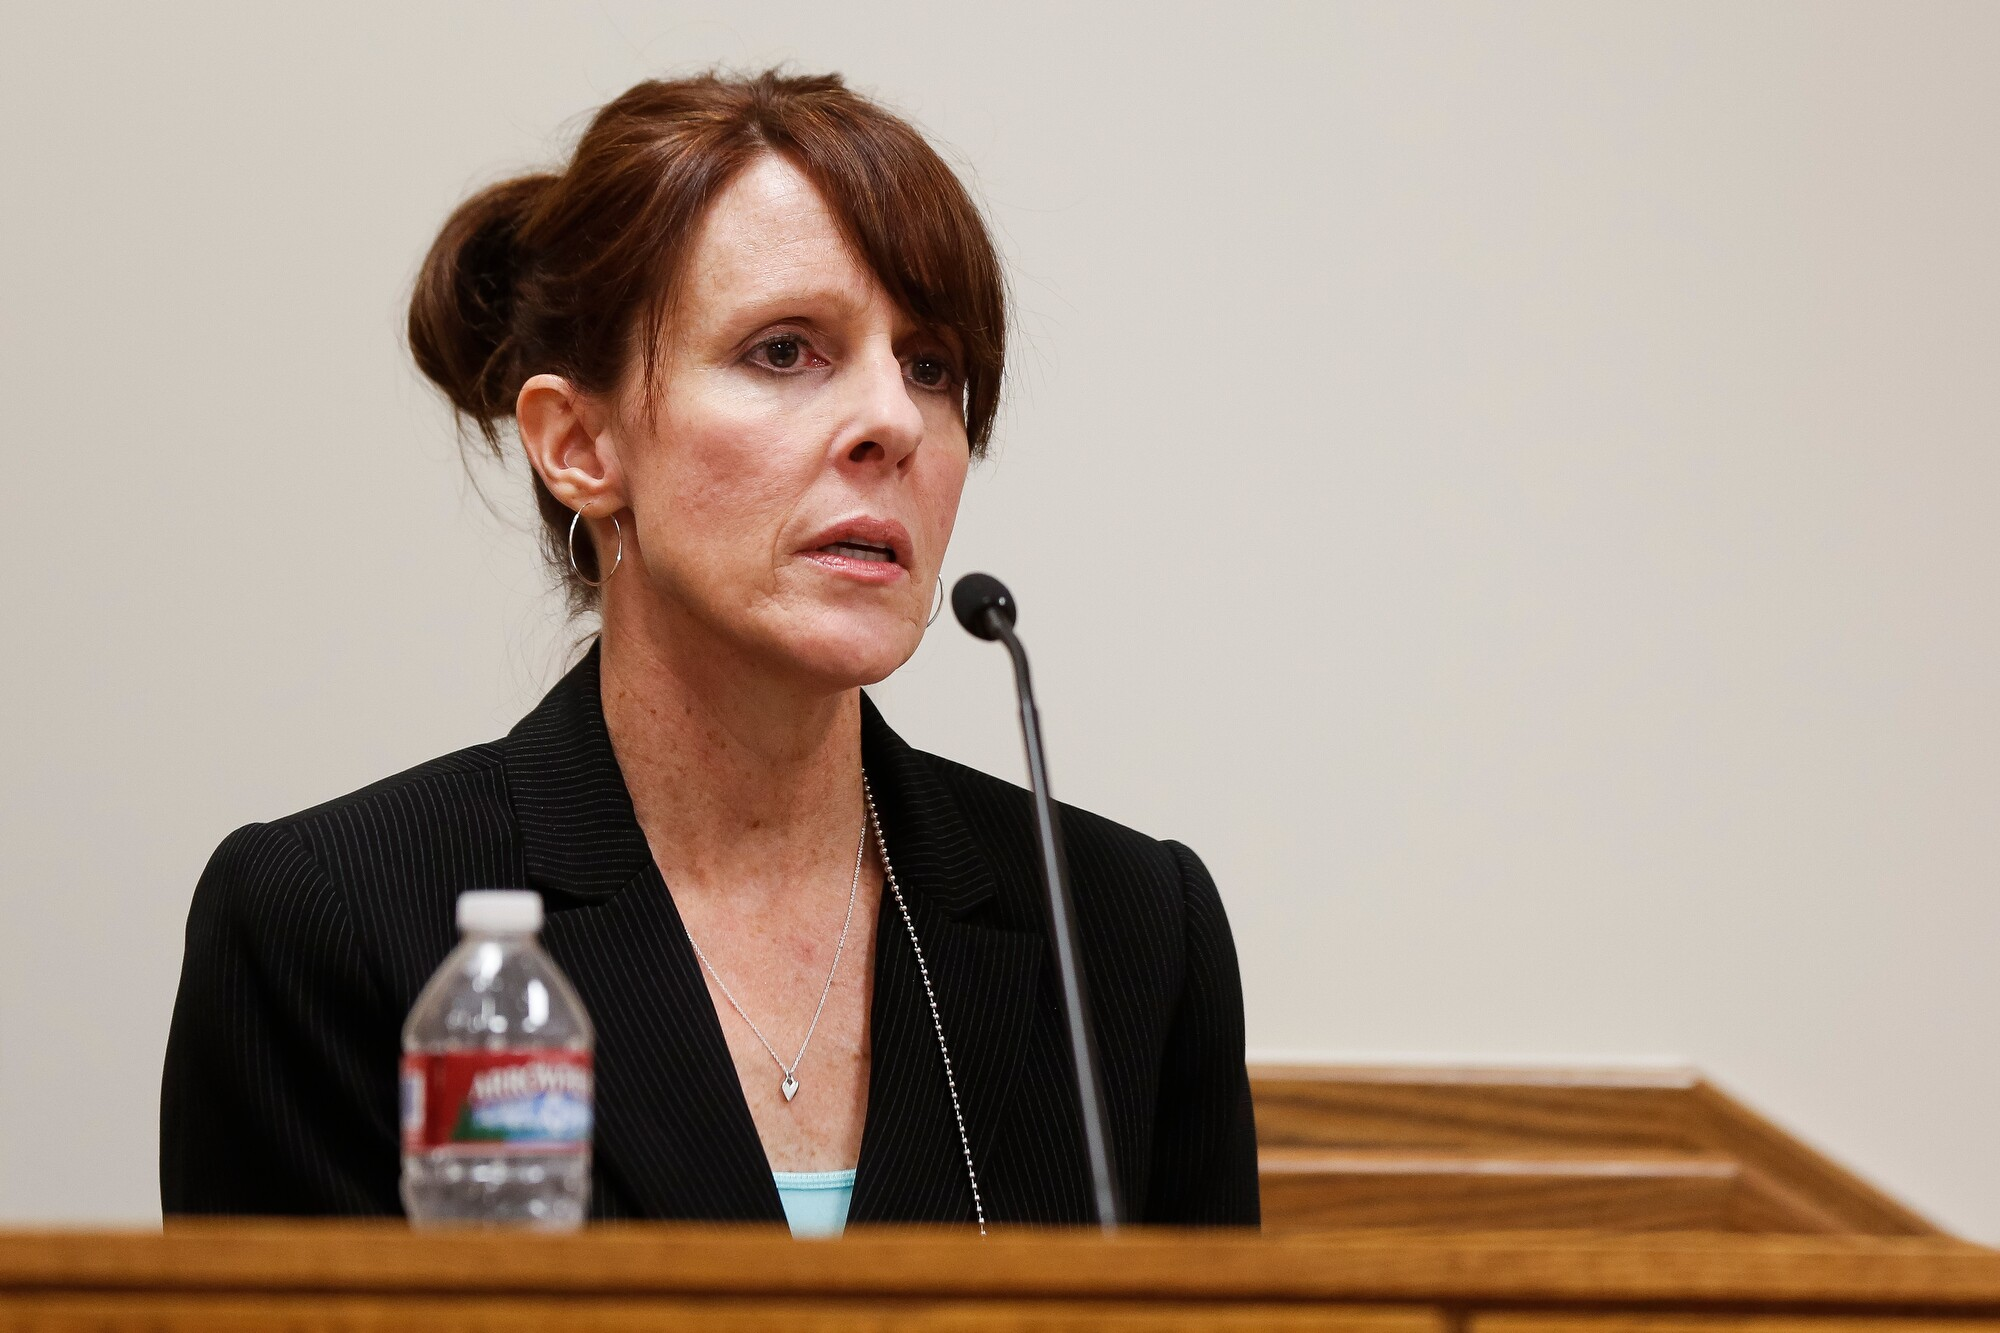 Photos: Meagan Grunwald faces aggressive cross-examination in murdertrial